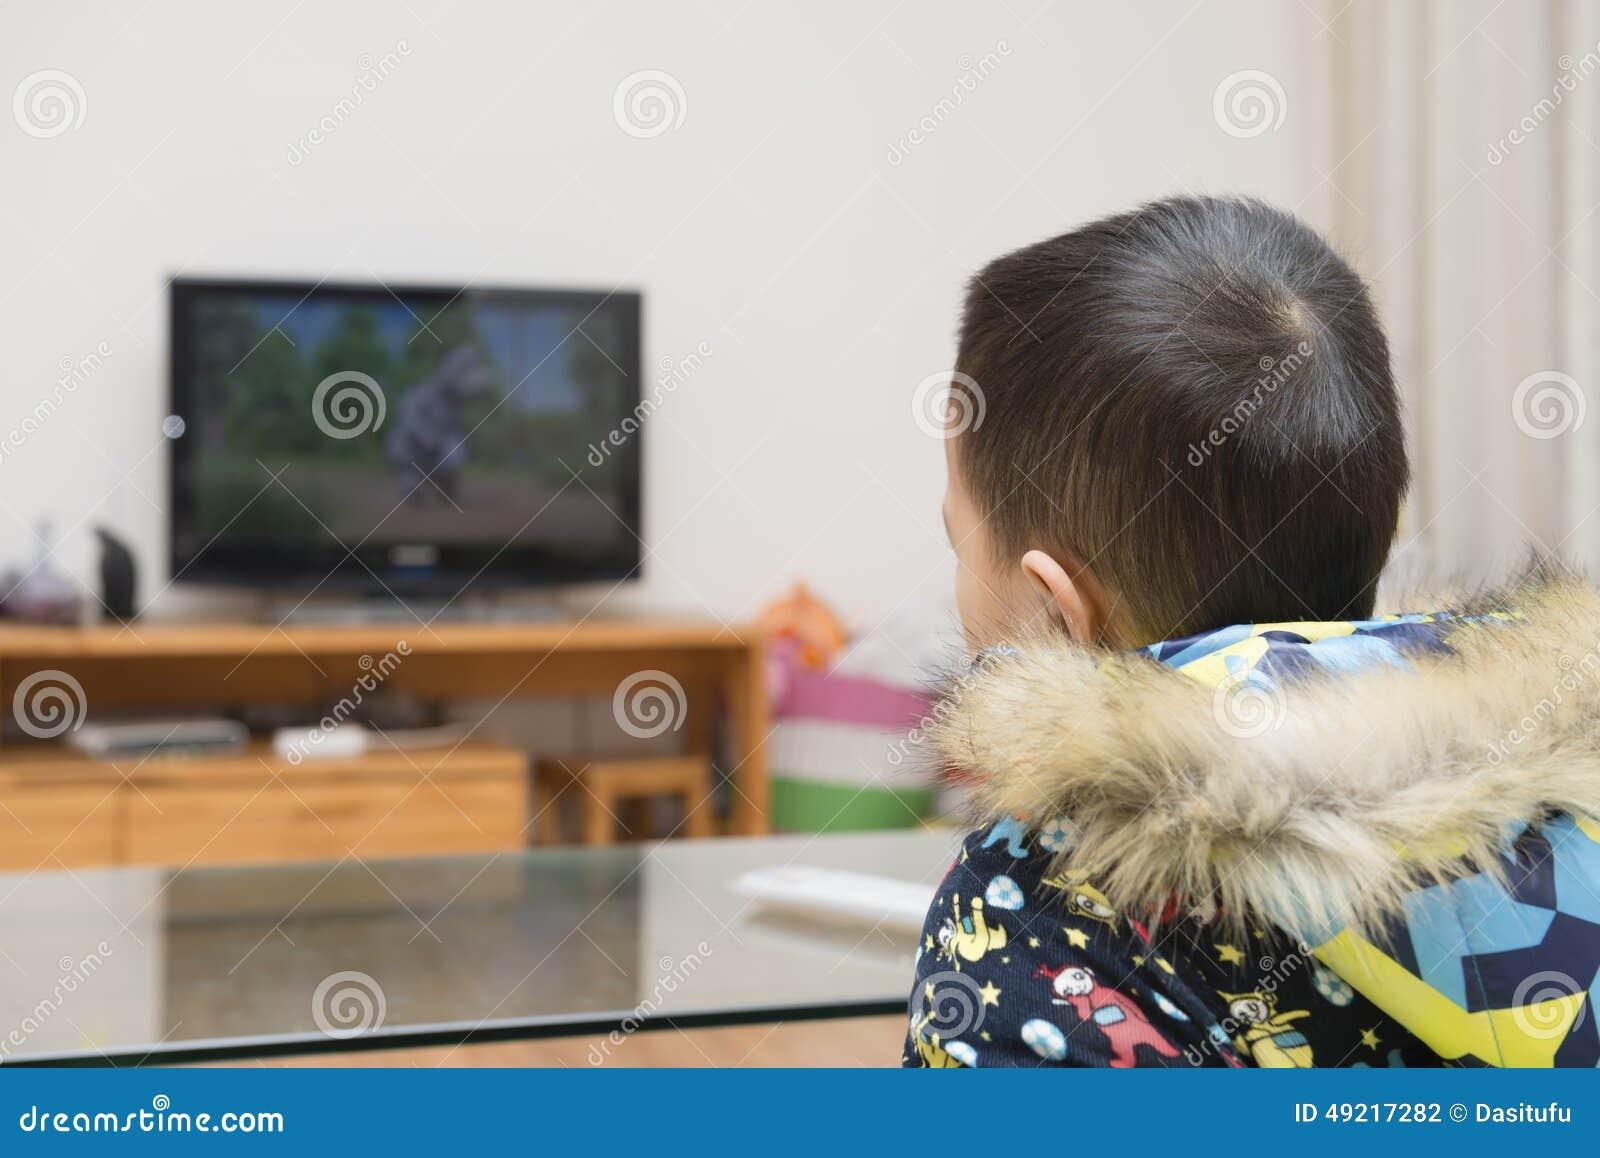 Boy watching cartoon TV